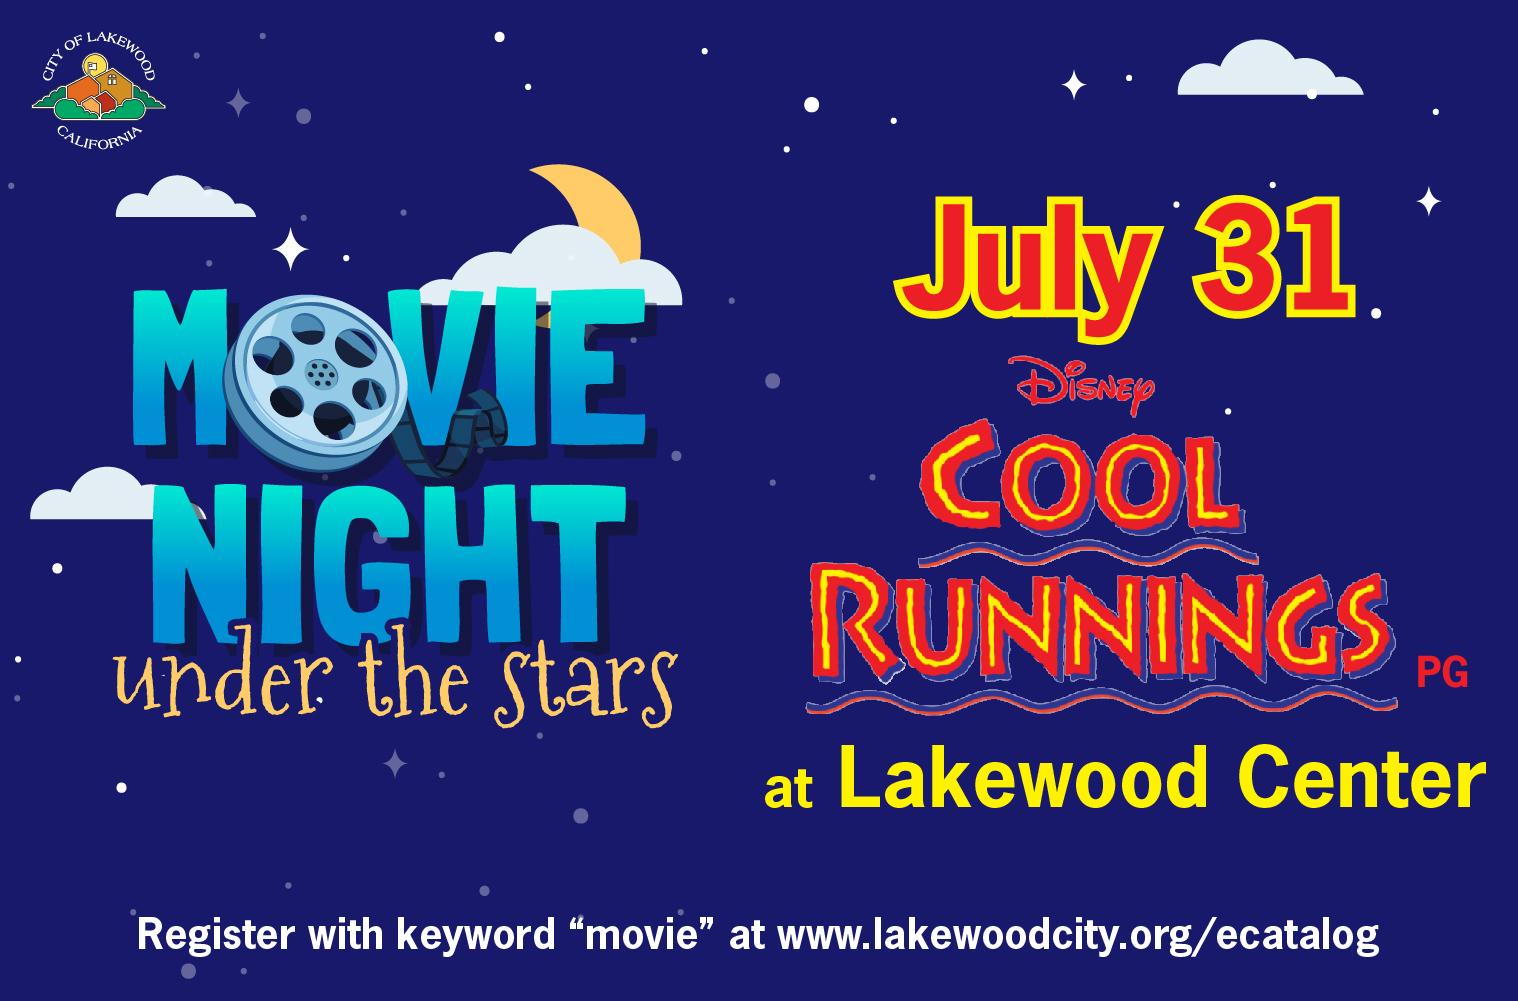 movie night under the stars flyer cool runnings